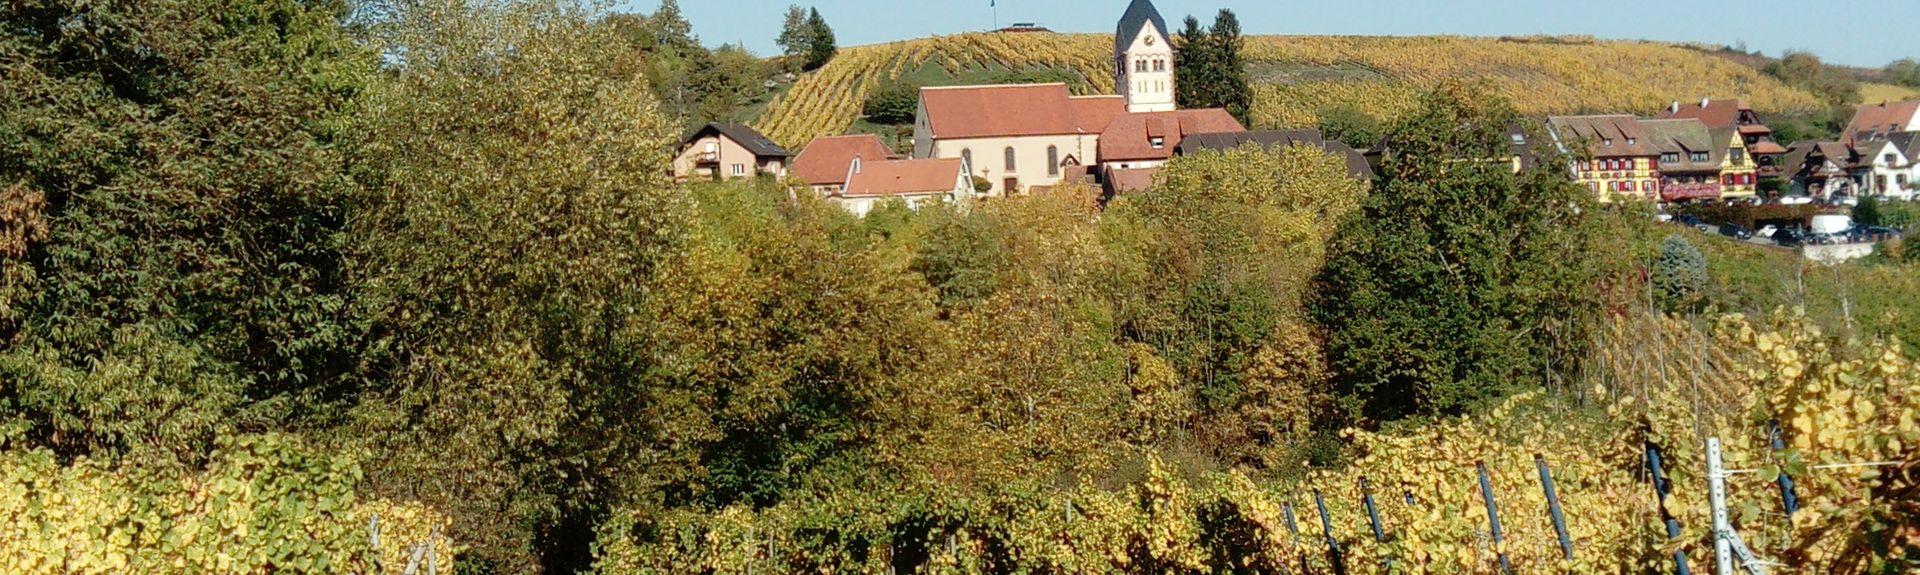 Neubois, Departamento del Bajo Rin, Francia